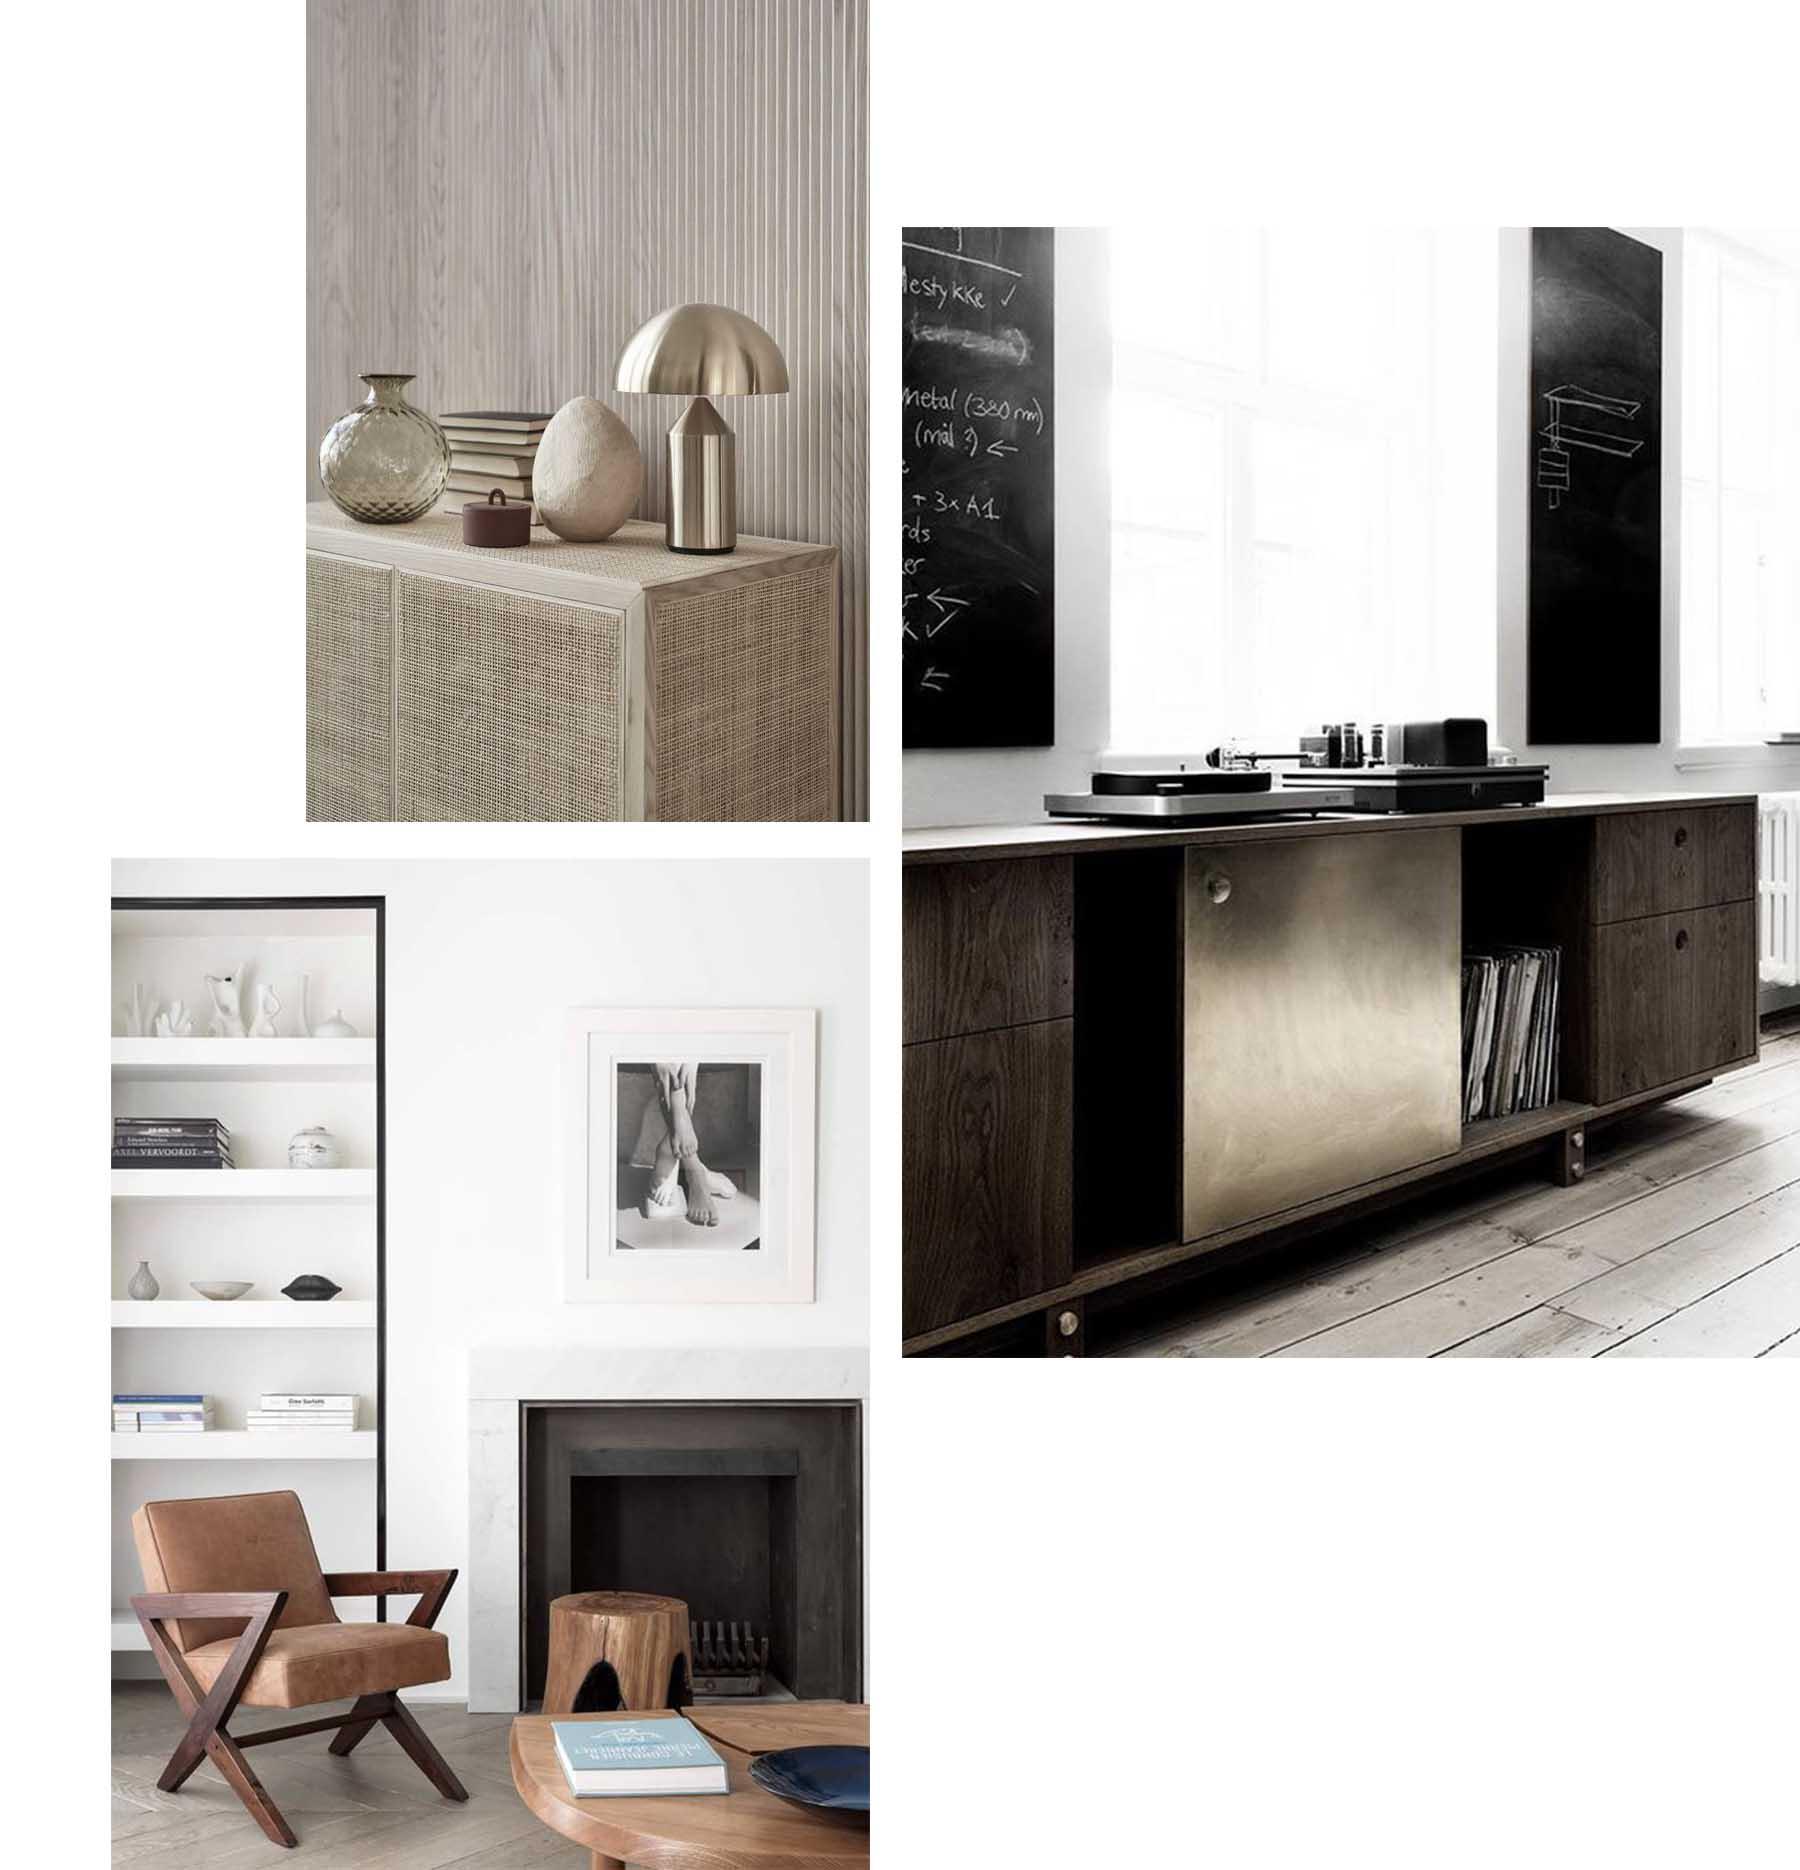 sydney best interior design sevice advice copy.jpg